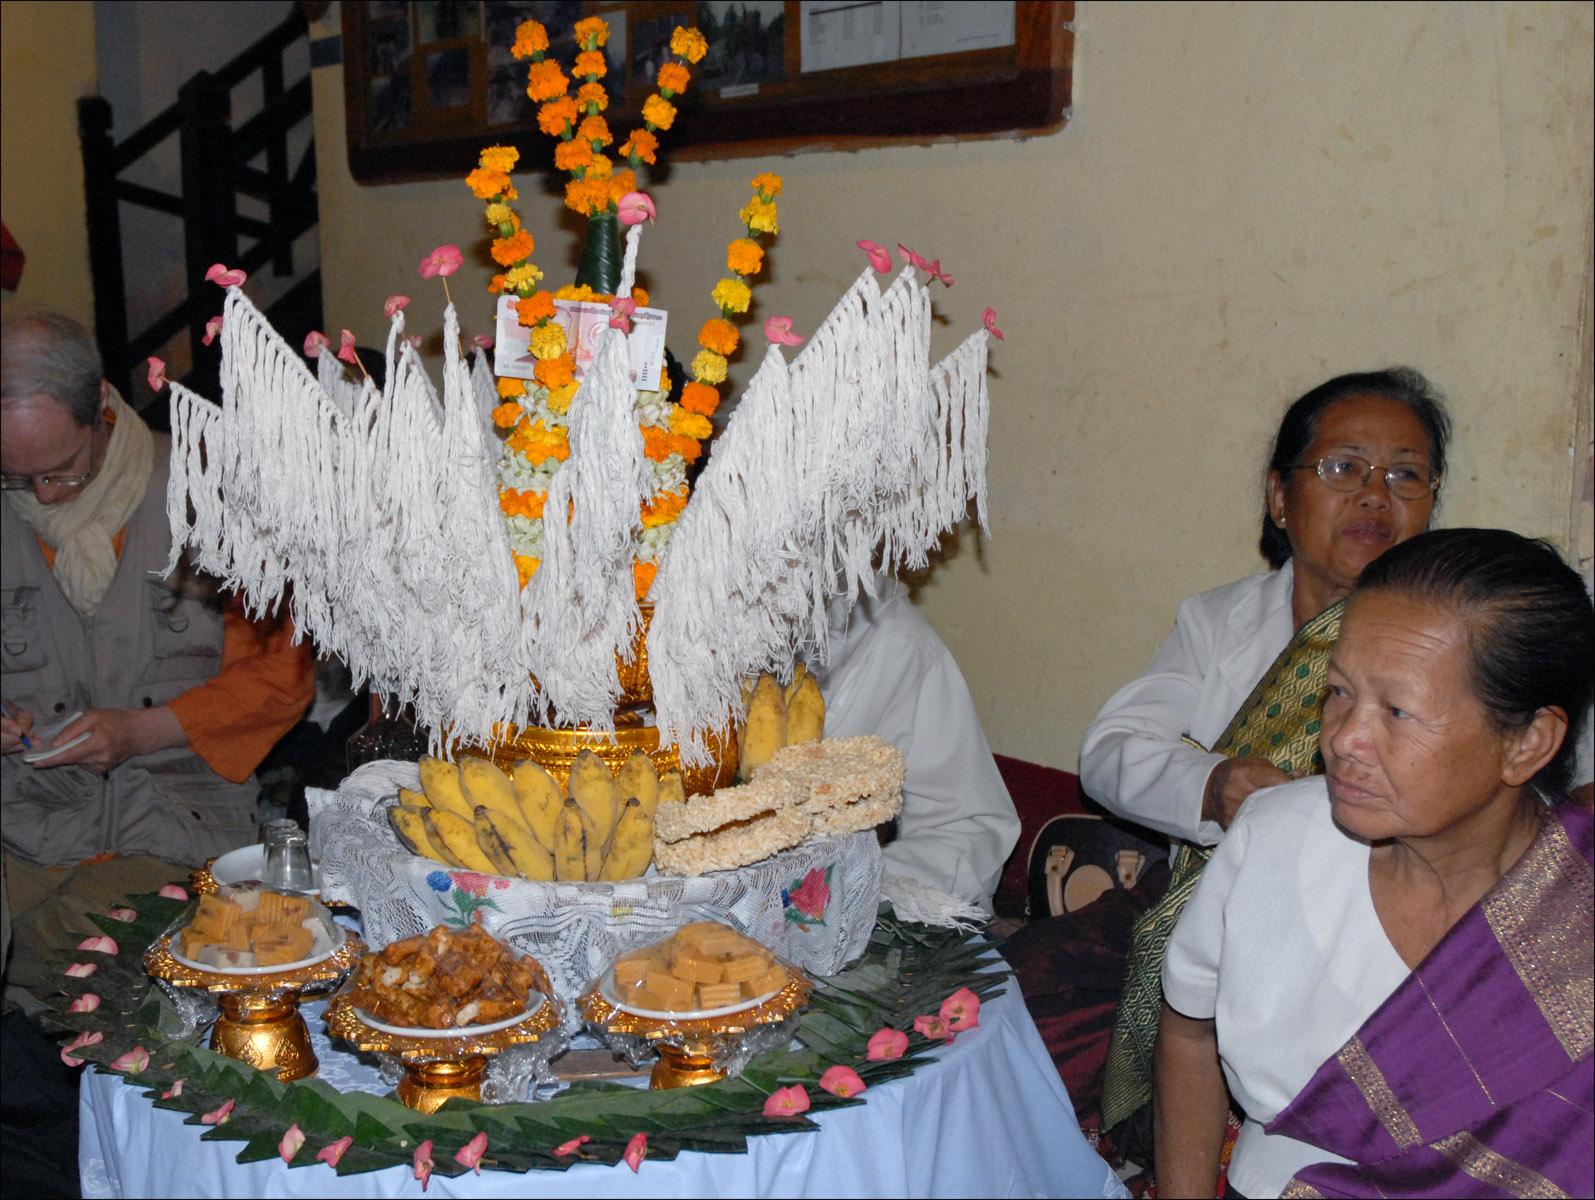 thai wedding flowers represent